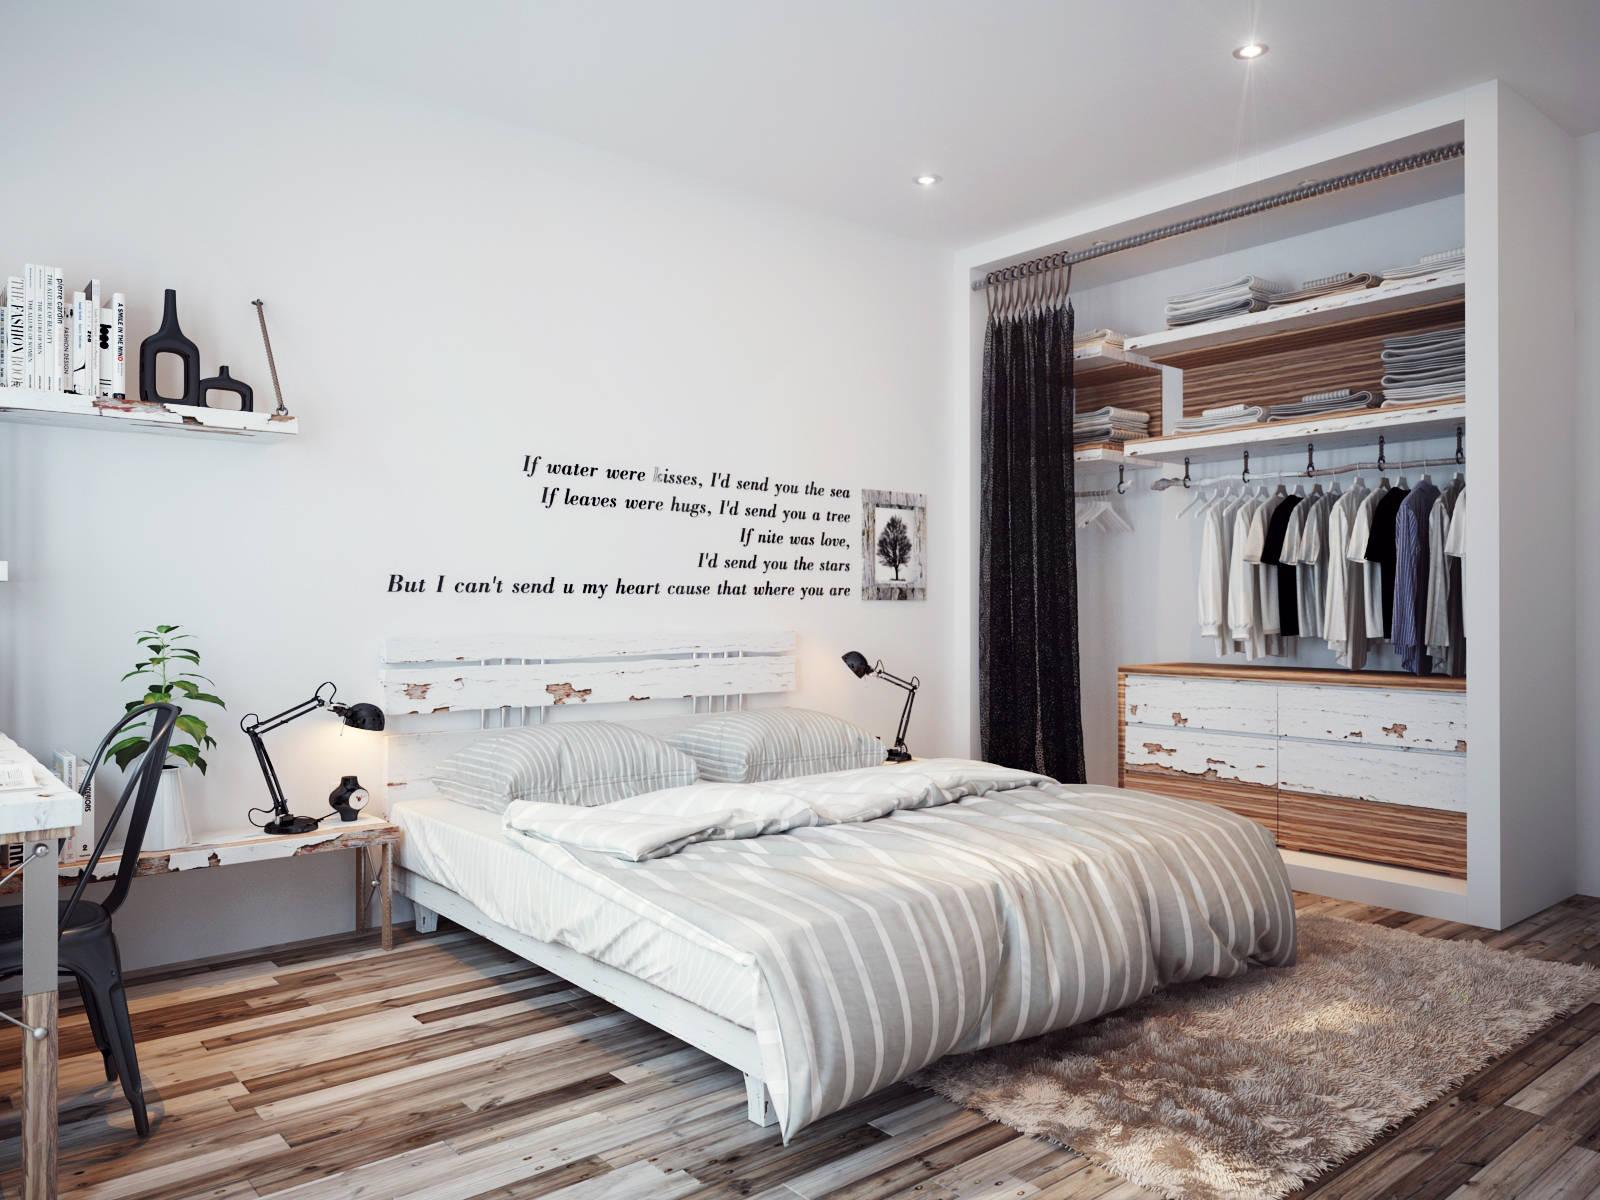 bedroom wall quote | Interior Design Ideas. on Bedroom Wall Decor  id=25316